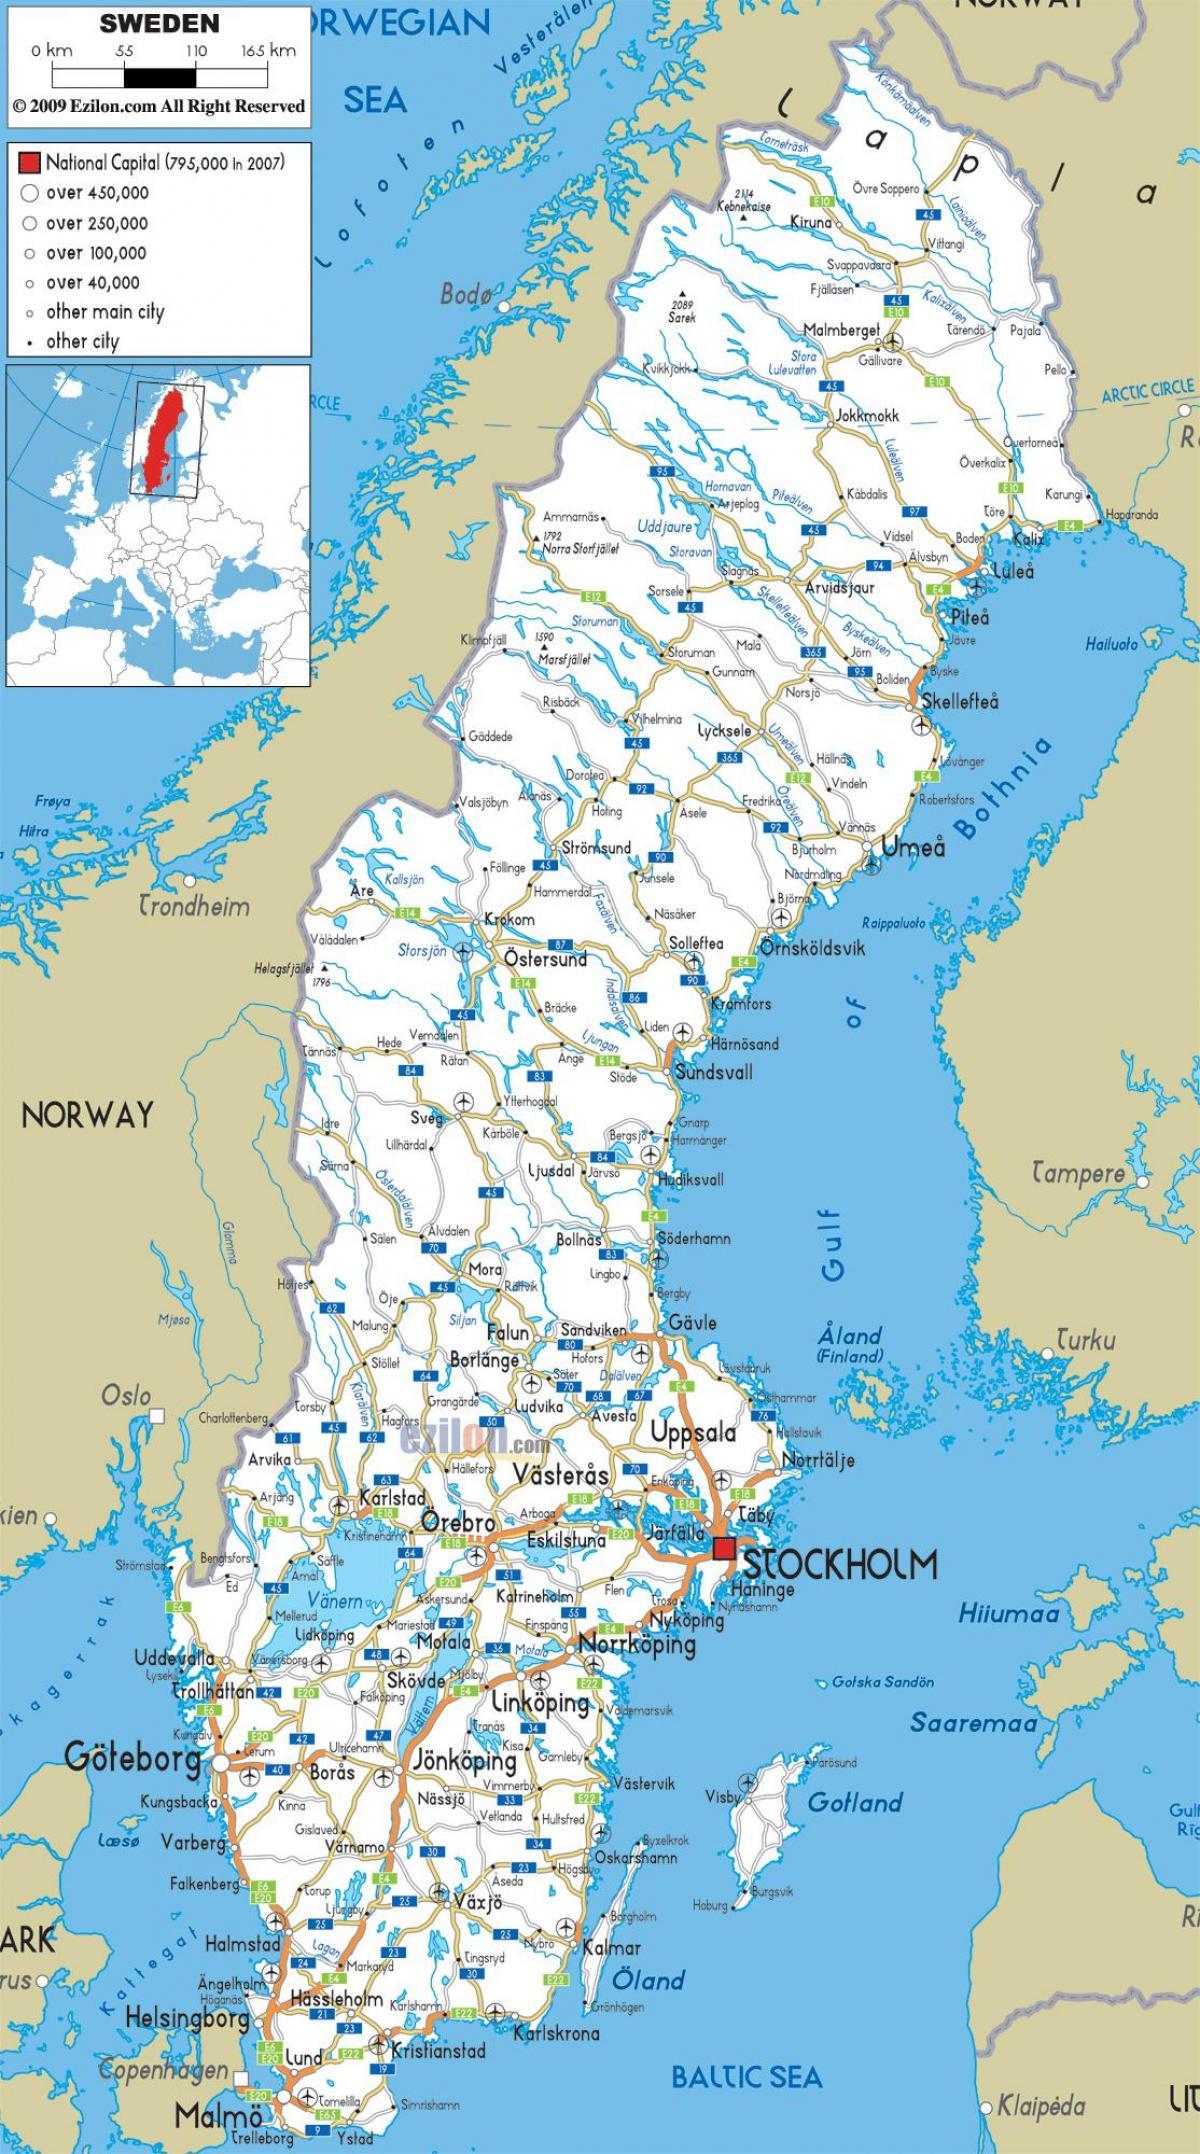 Sverige Koreplan Koreplan Sverige I Det Nordlige Europa